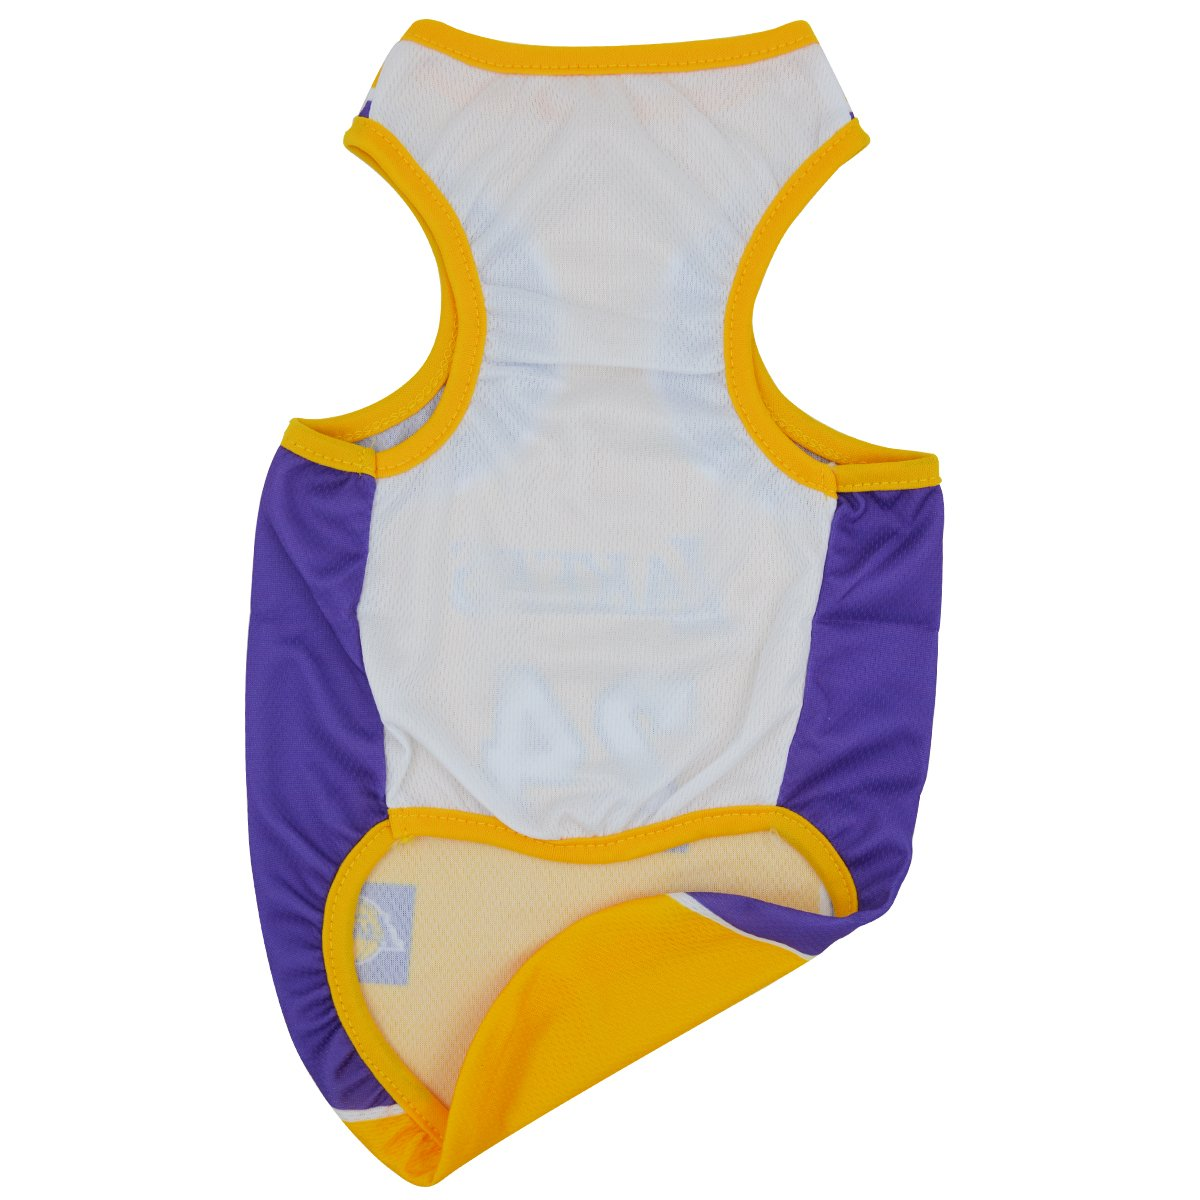 ideal para la temporada de verano Camiseta de baloncesto para mascotas c/ómoda para perro o gato de Yuno de malla